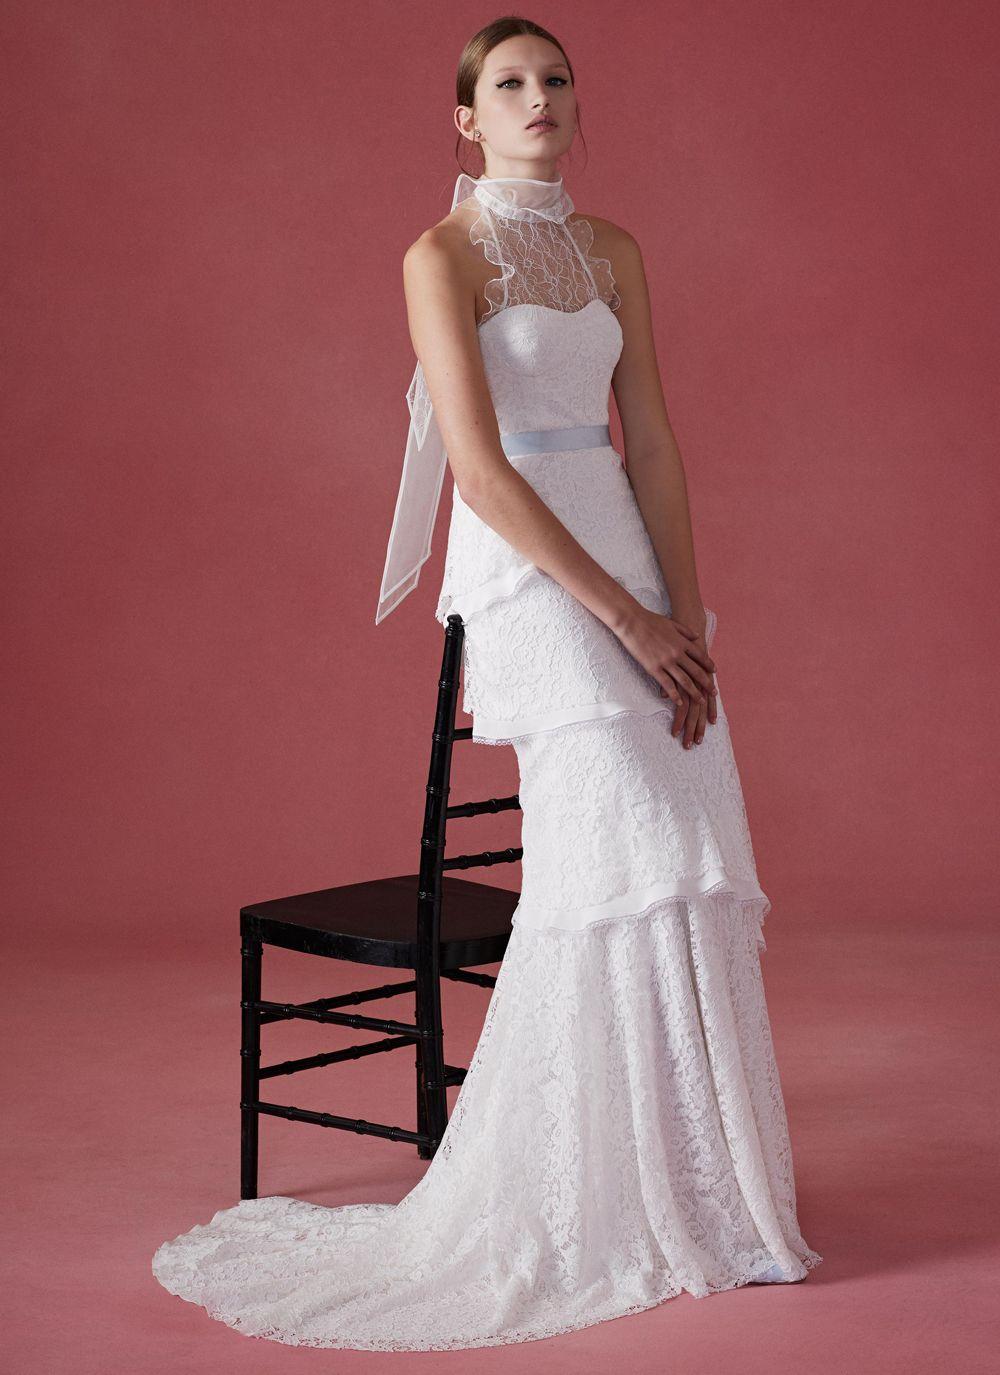 Photo: Oscar de la Renta | Robes de mariée | Pinterest | Dressing gown